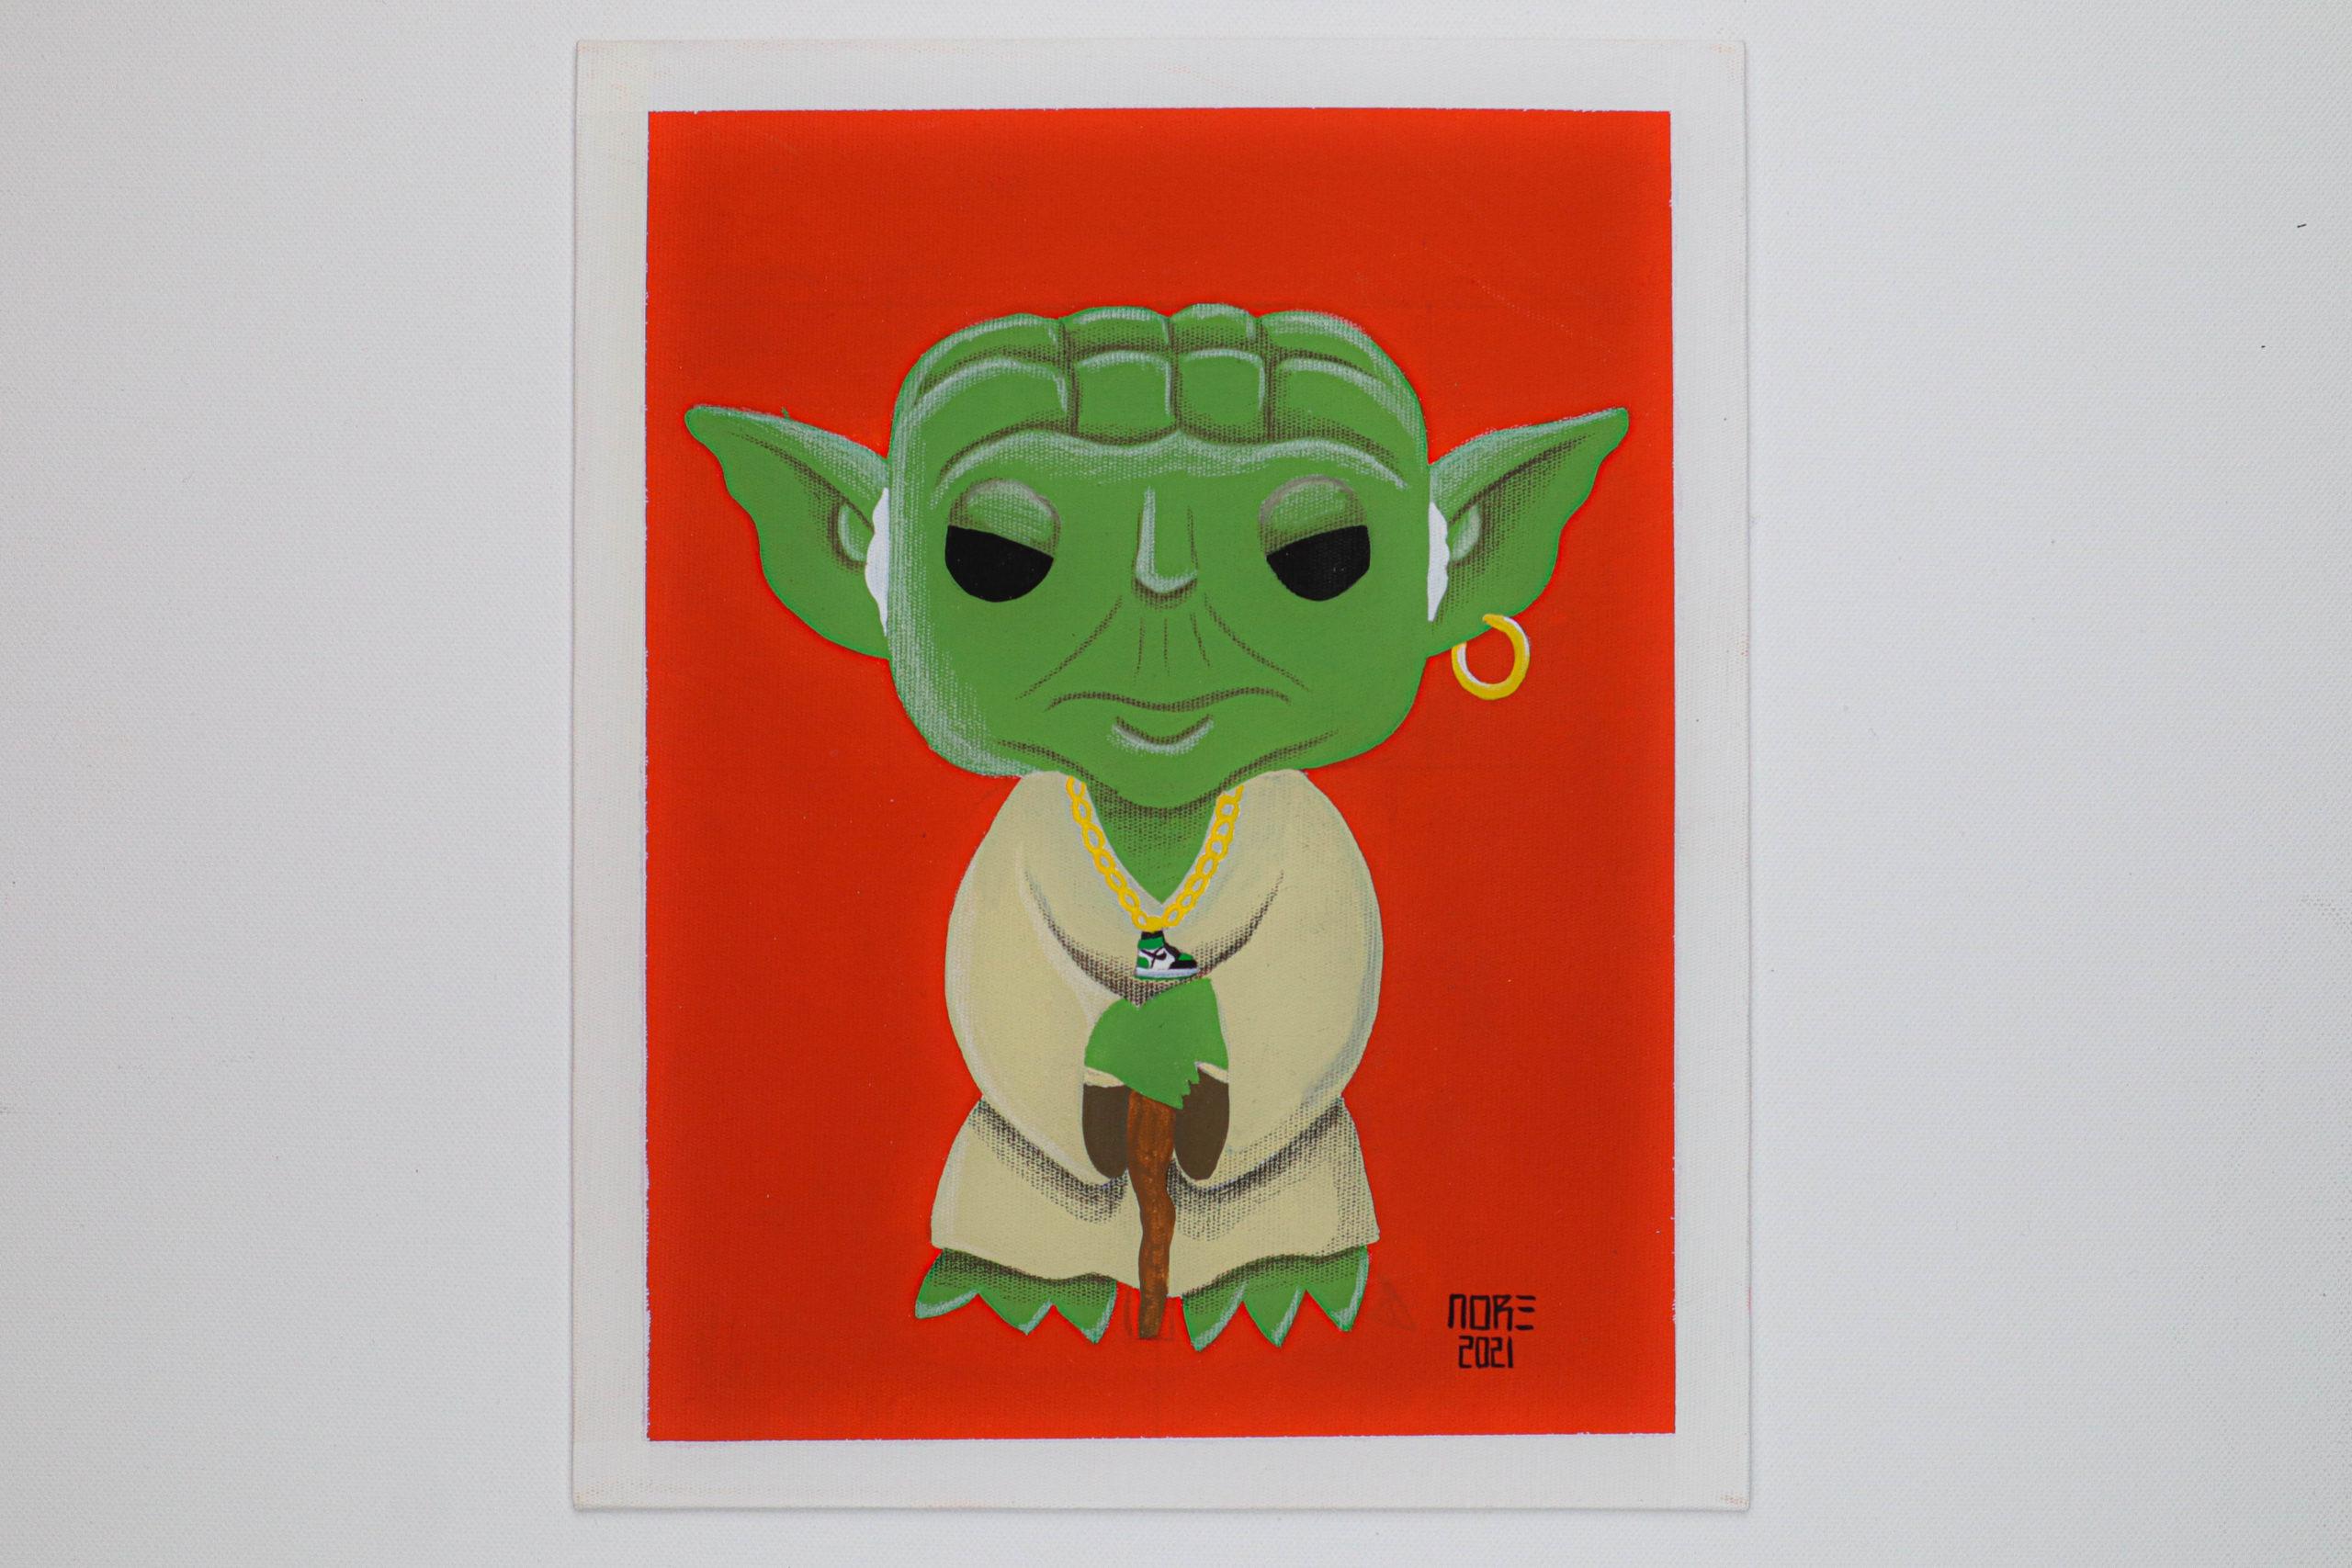 """Yoda x Jordan 1 green Og"""